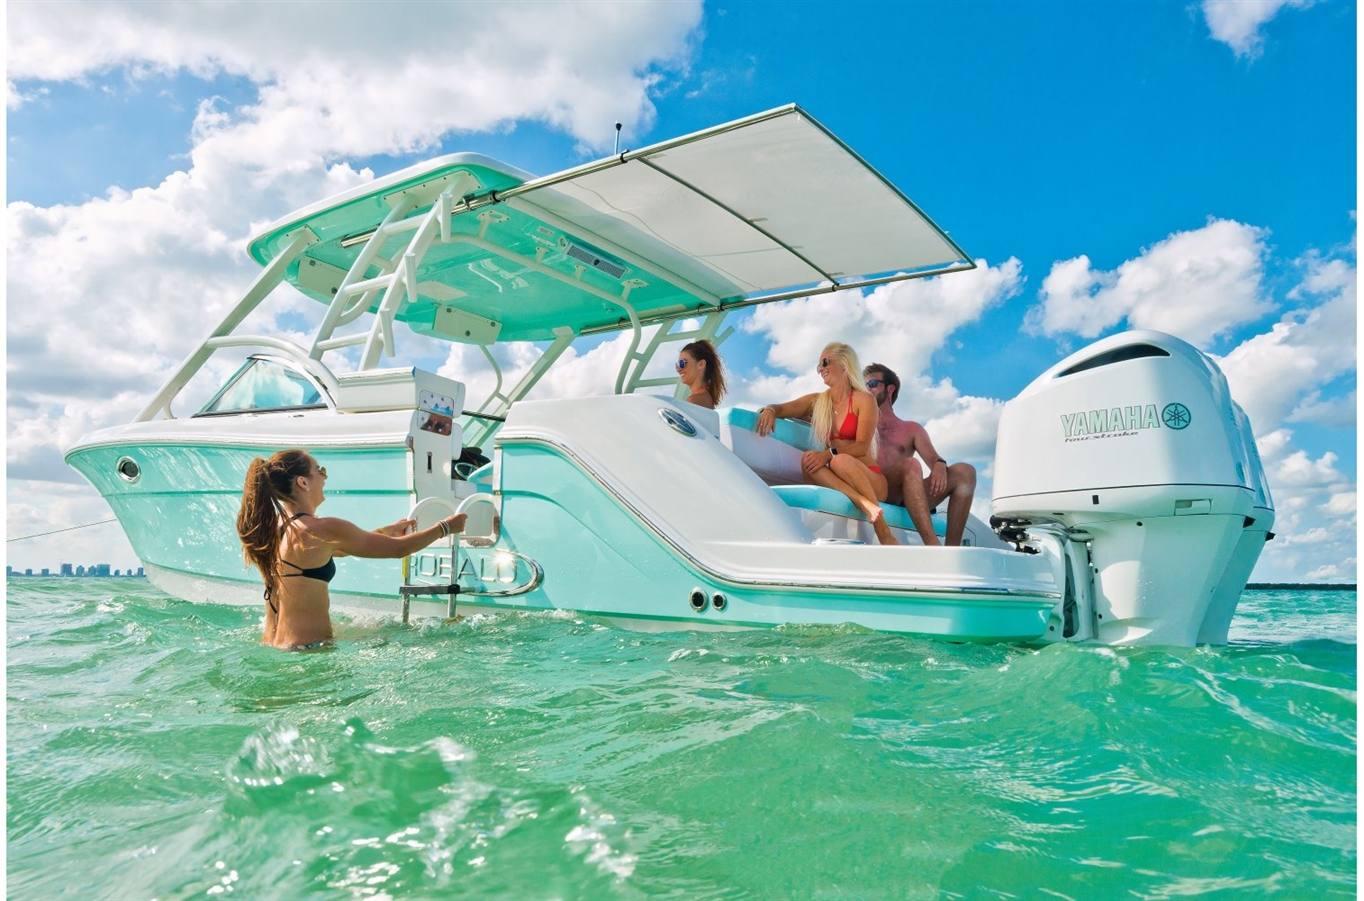 2019 Robalo R317 for sale in Kailua, HI  Windward Boats